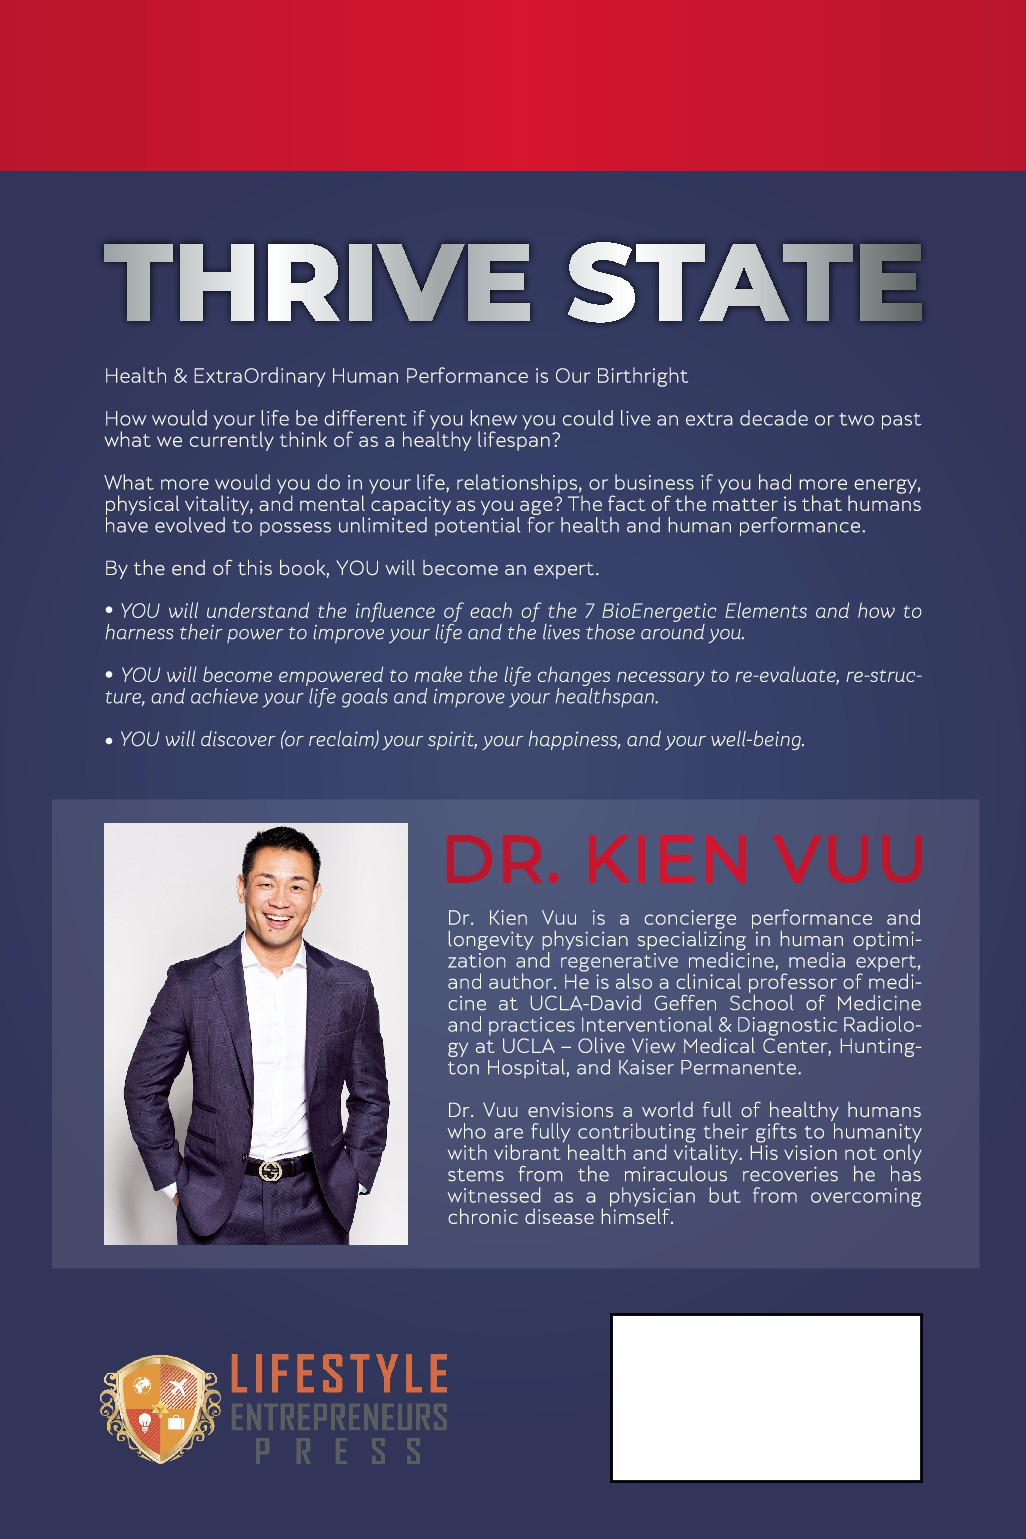 THRIVE STATE - Book Cover Design for UCLA Professor of Medicine